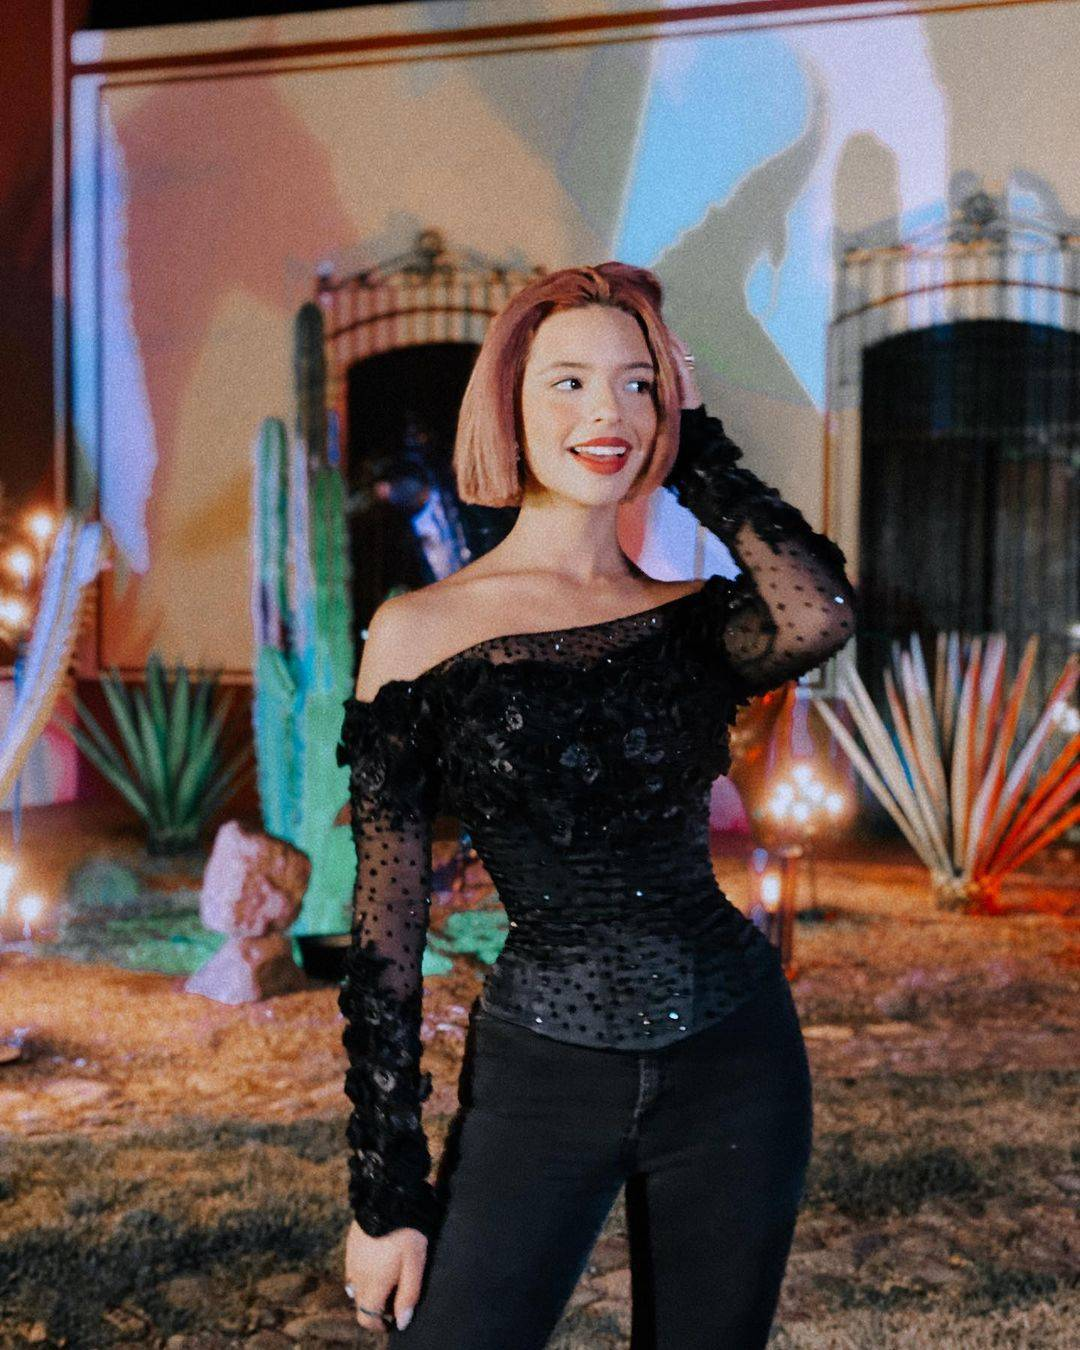 Ángela Aguilar looks navidad